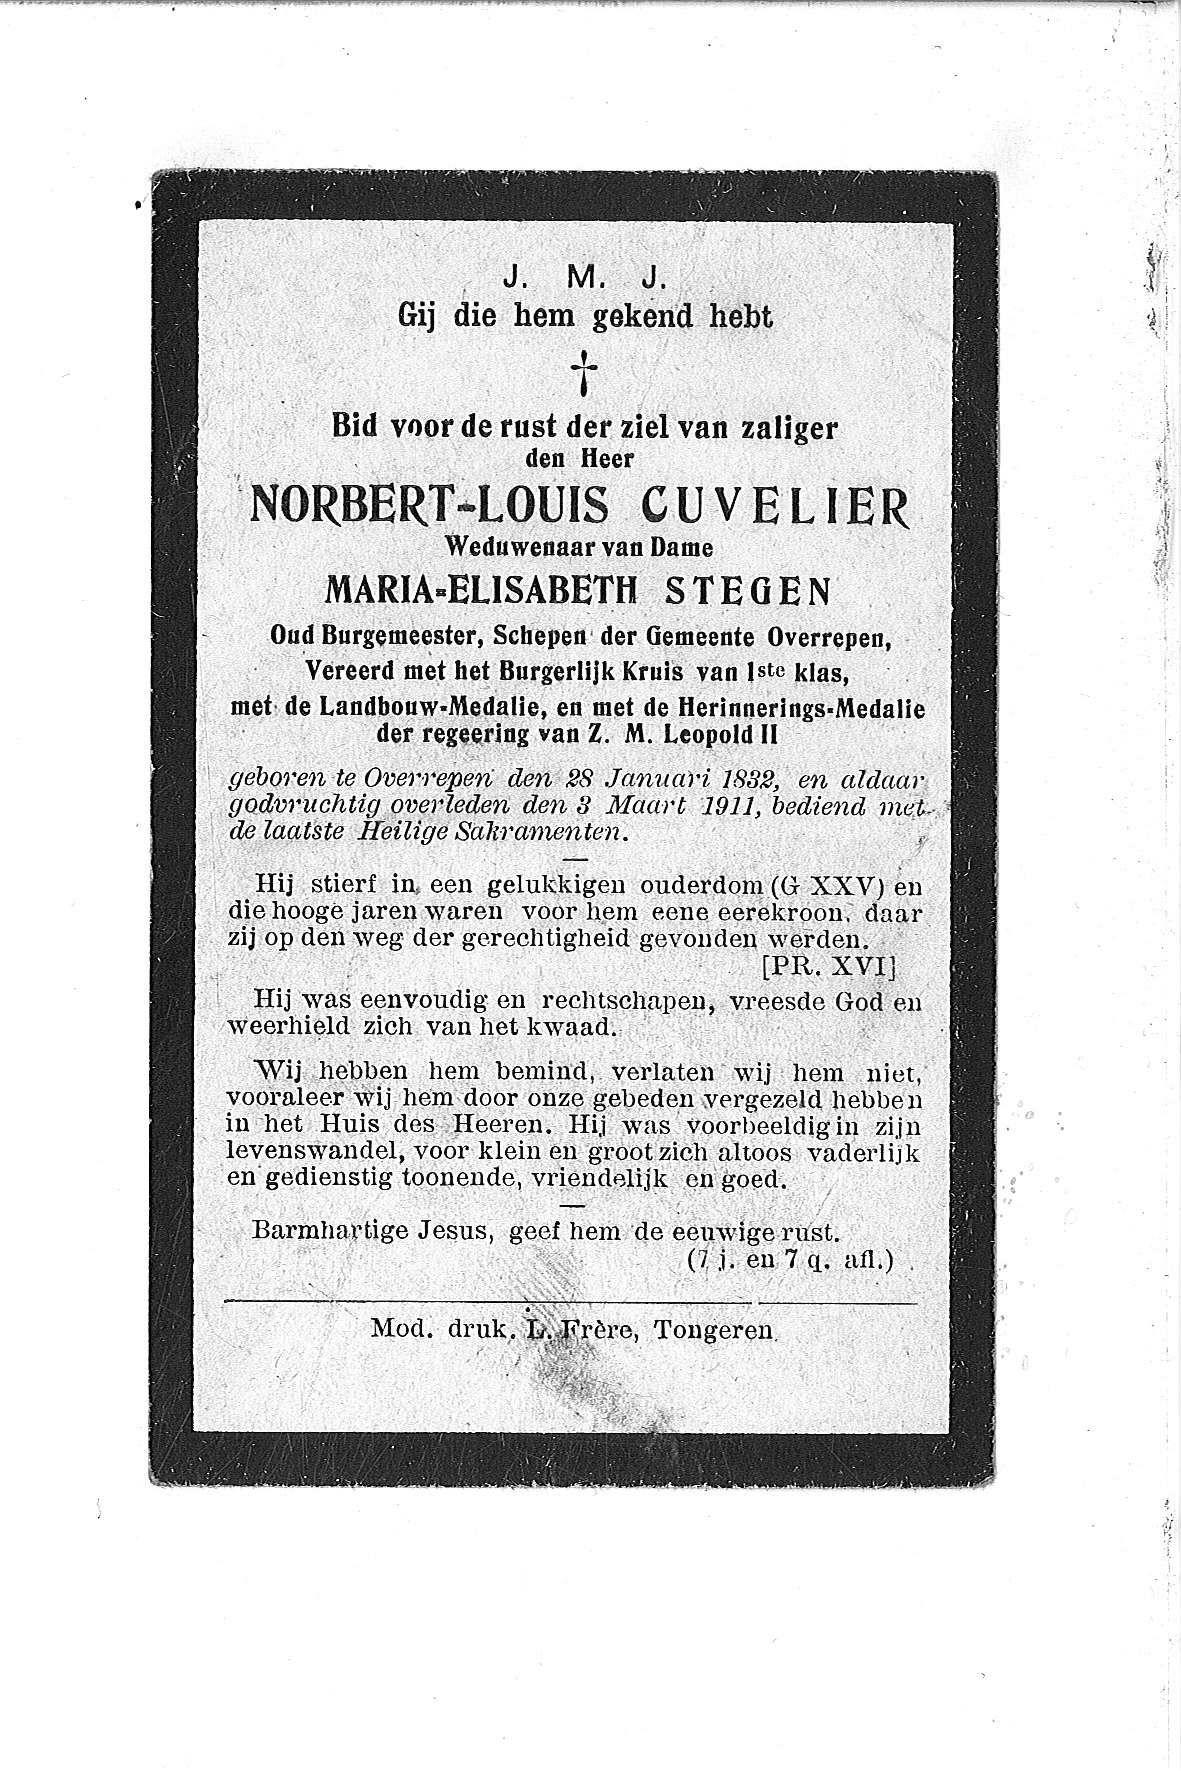 Norbert-Louis (1911) 20120123114116_00062.jpg